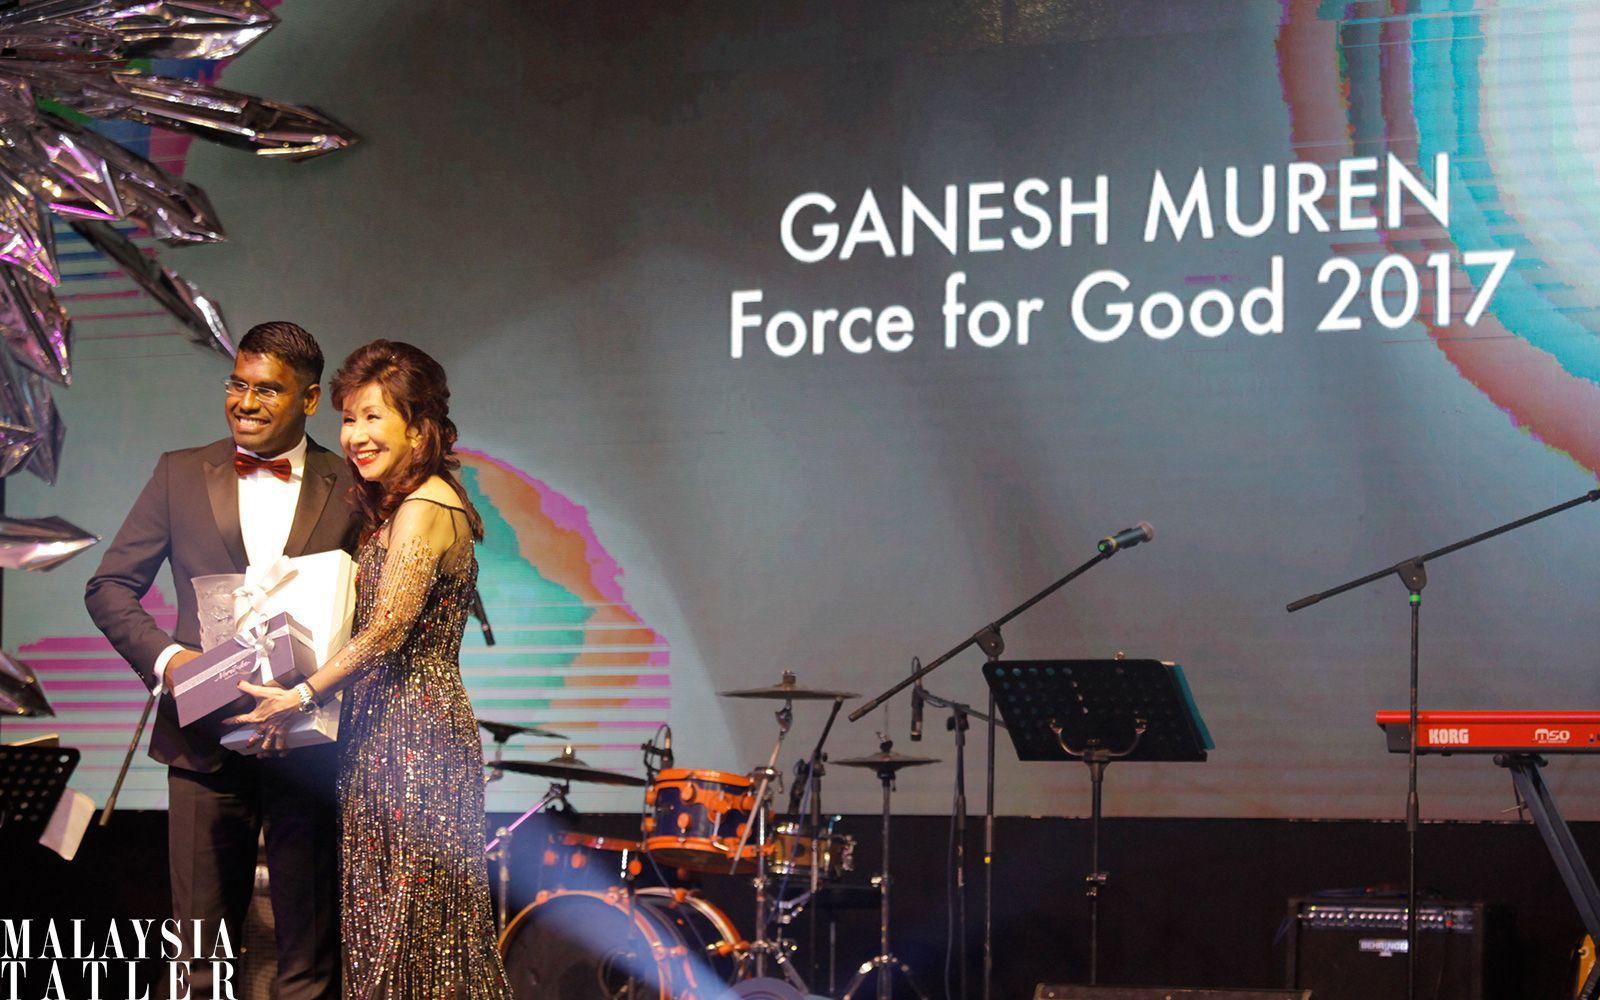 Ganesh Muren receiving his award